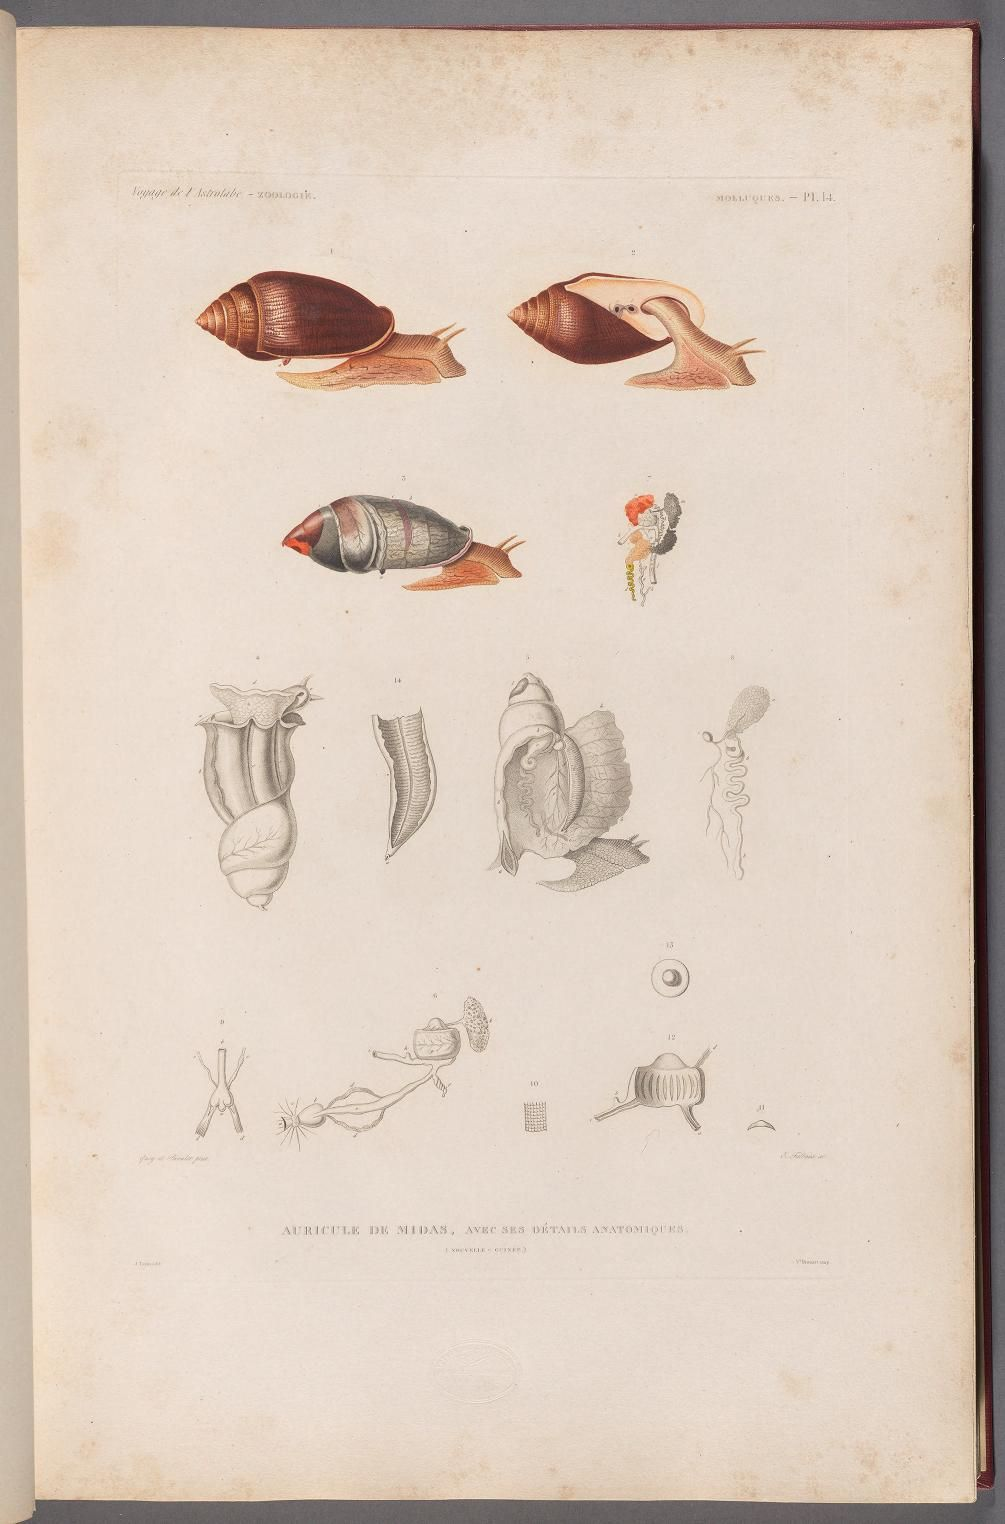 Mollusques and Zoophytes Atlas (1833) - Voyage de la corvette l'Astrolabe : - Biodiversity Heritage Library